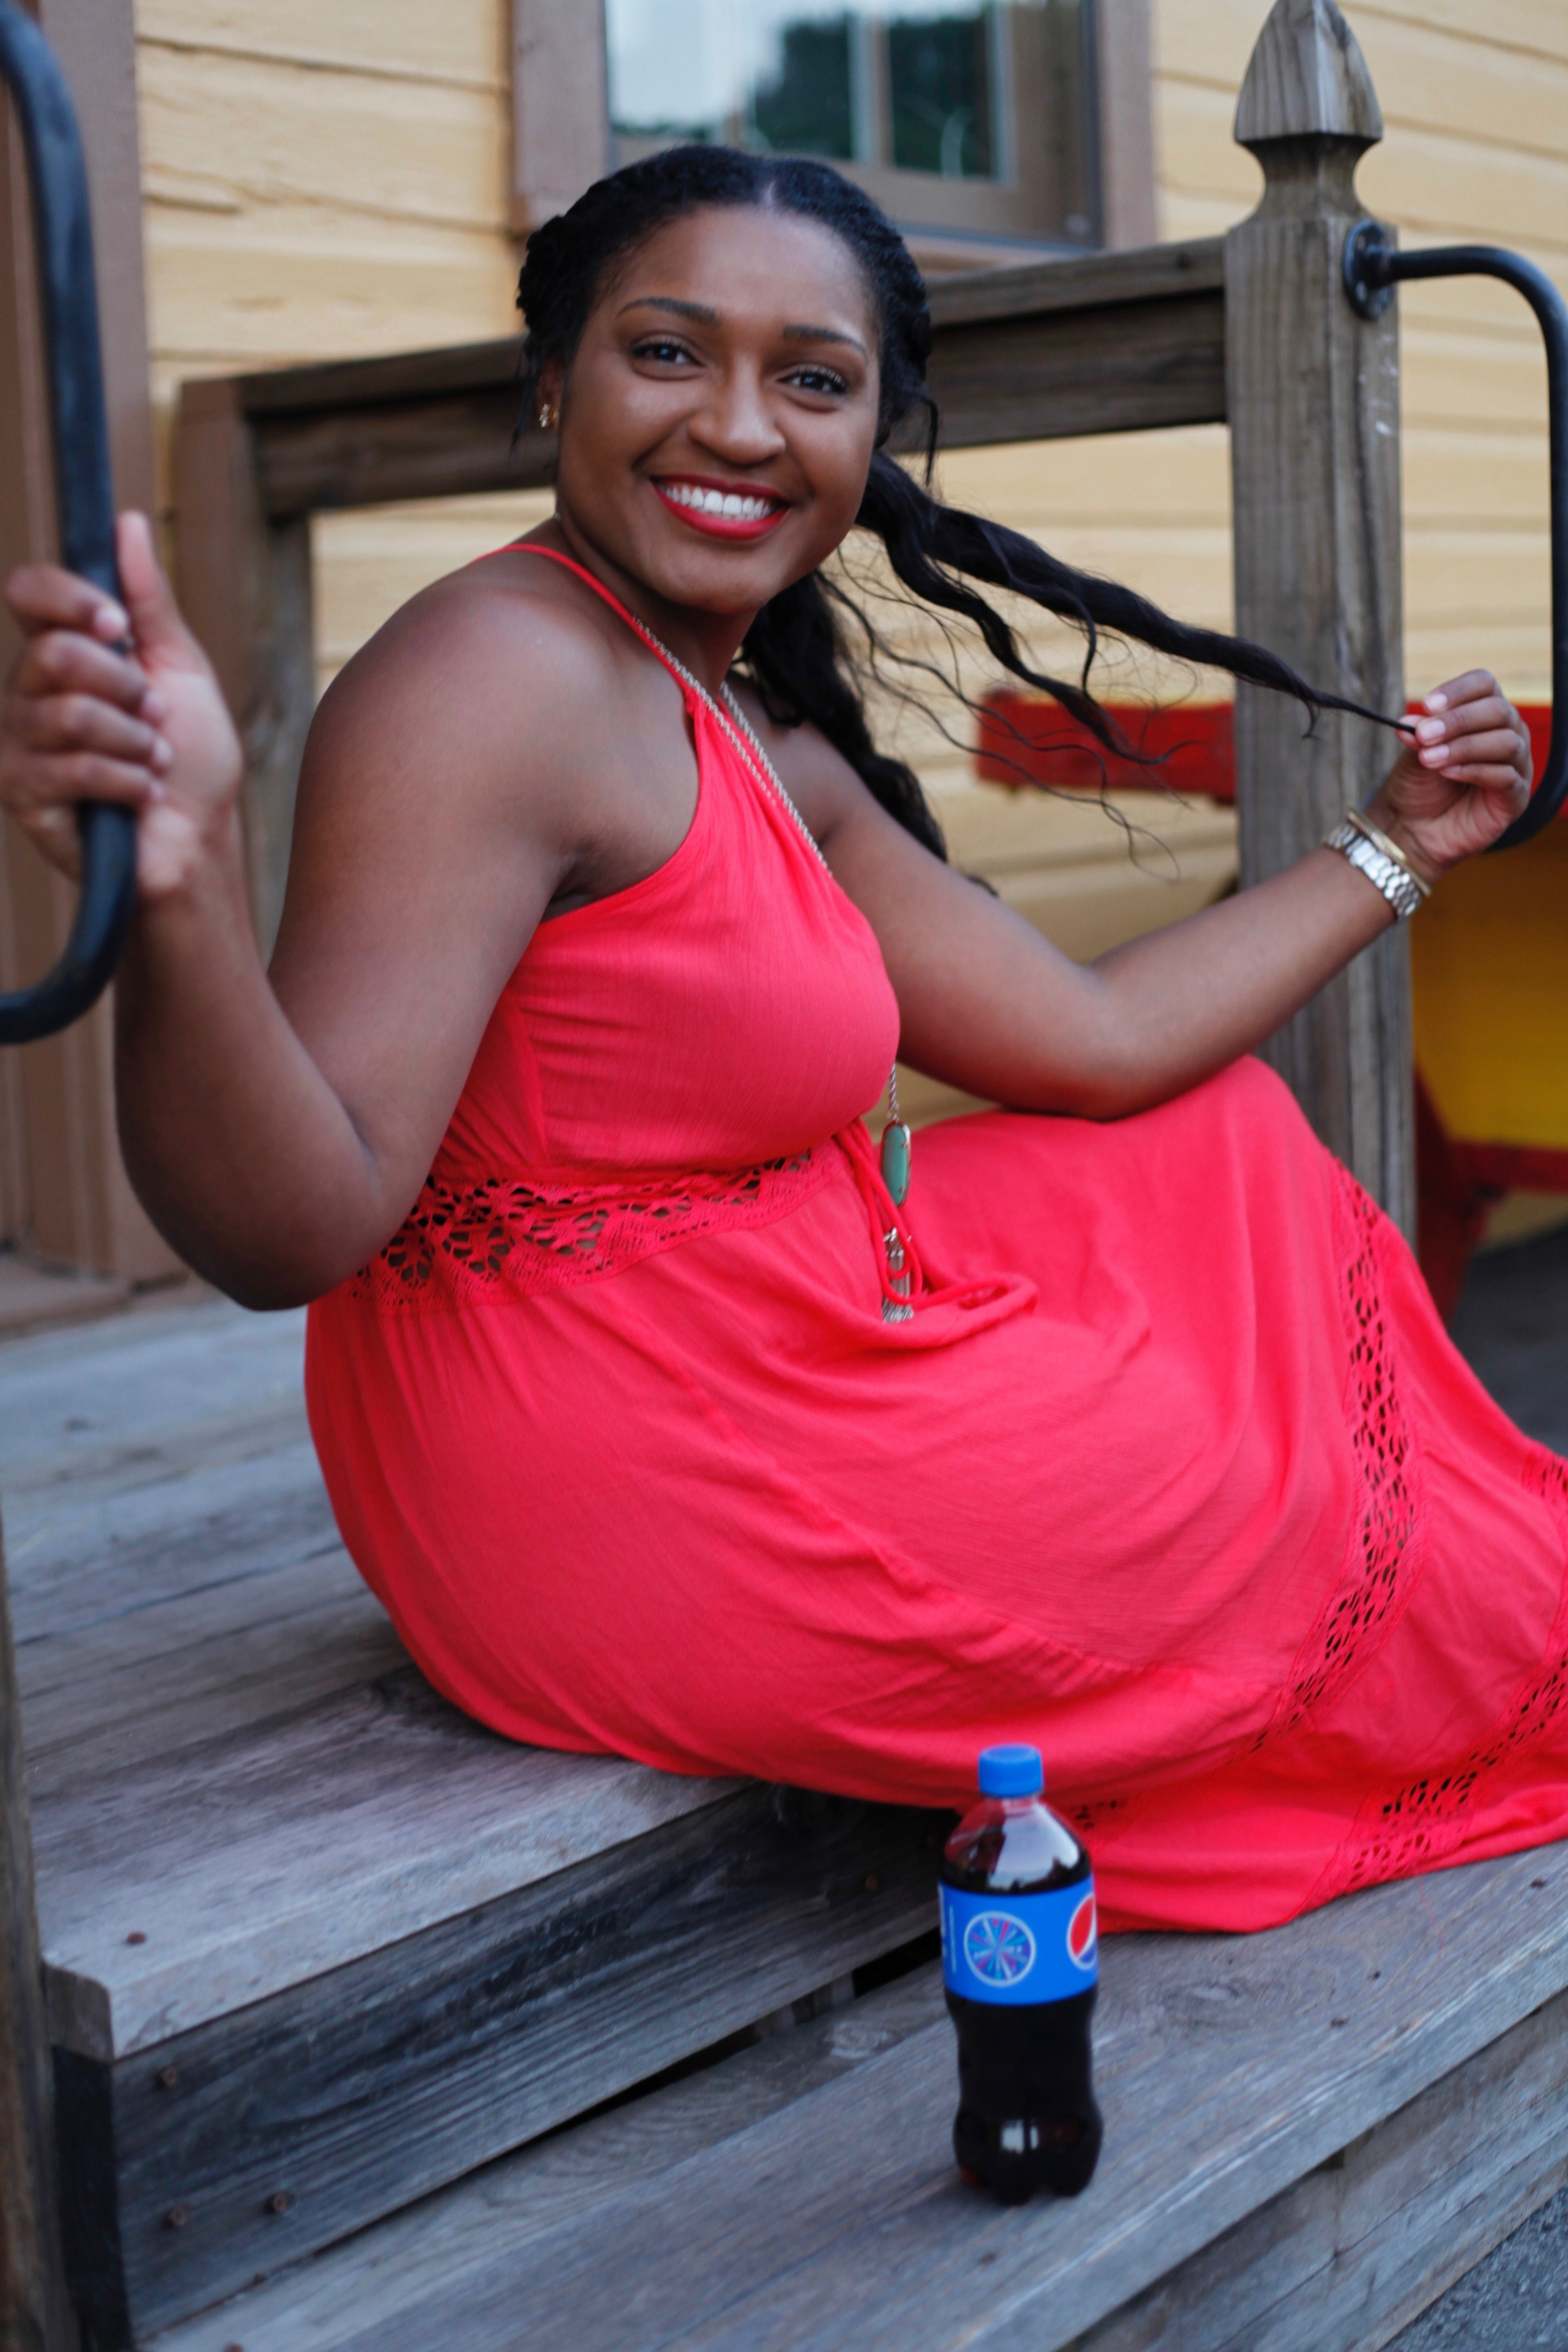 #sayitwithpepsi all summer 2016 with jasmine cooper of jasminediane.com